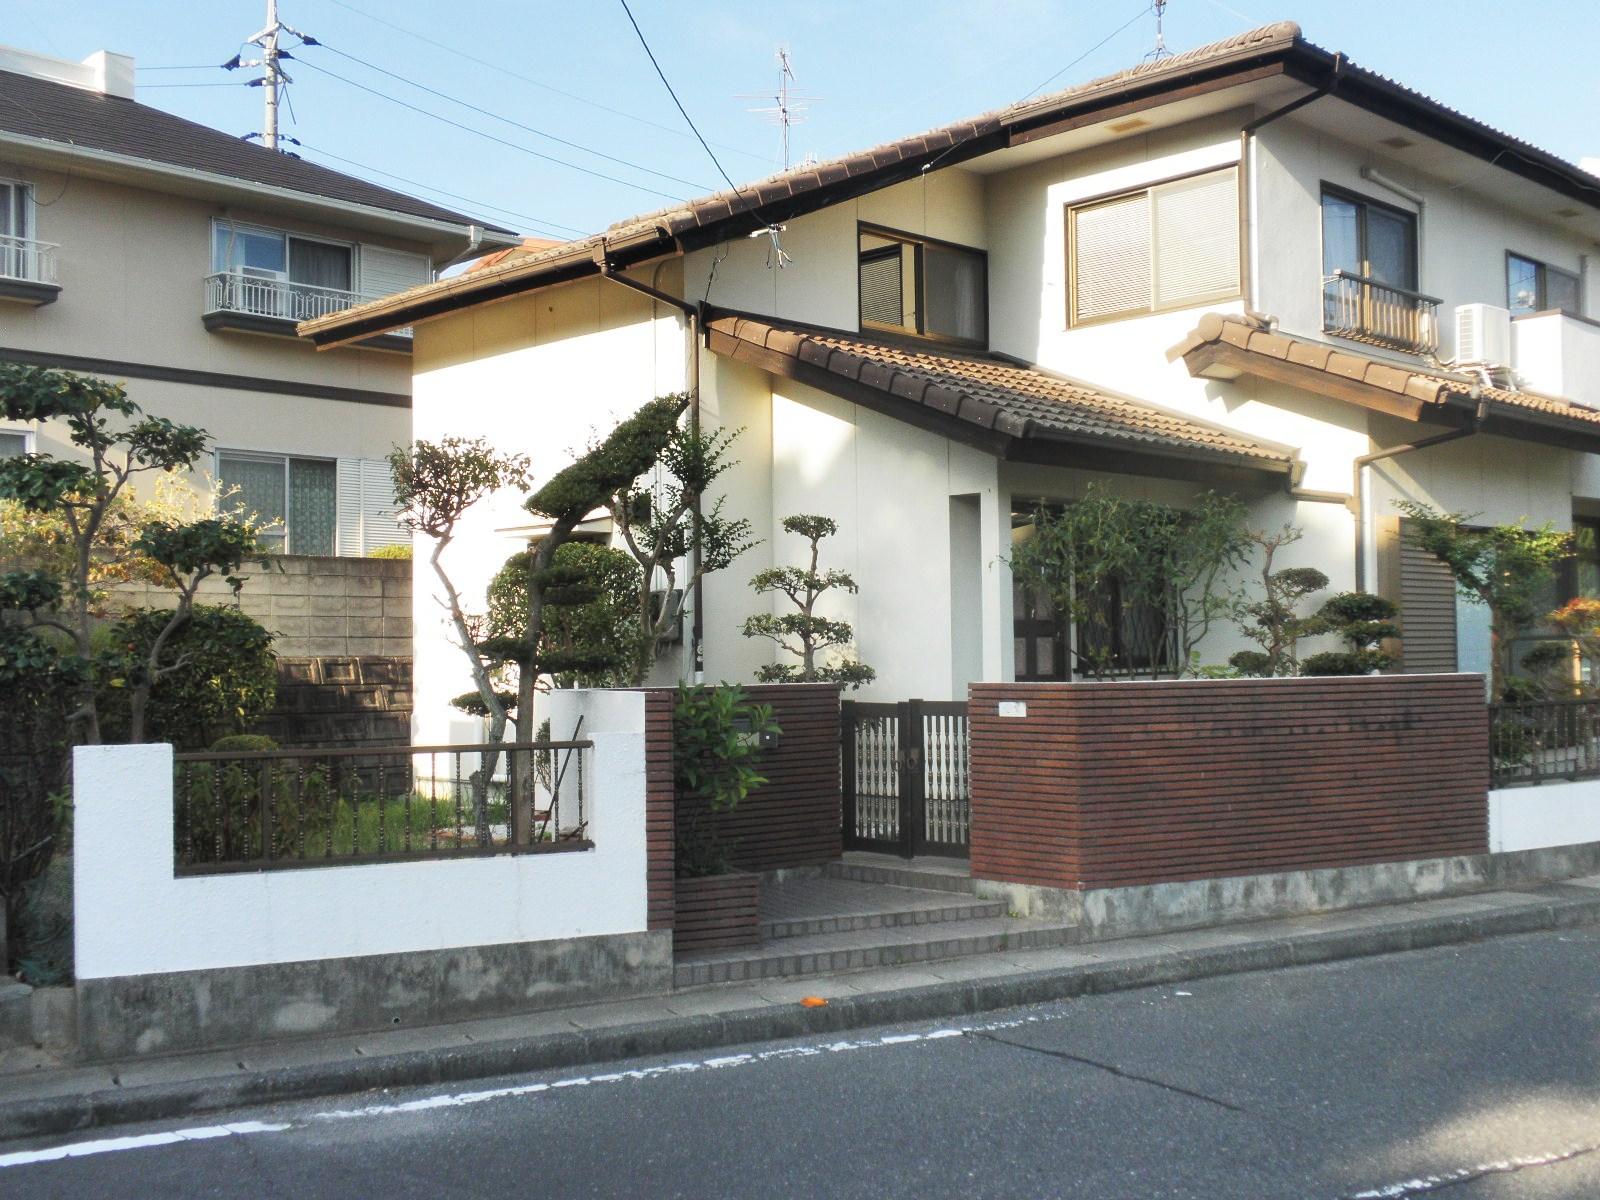 Destination japan exploring neighborhoods and yanai for Japan home design style